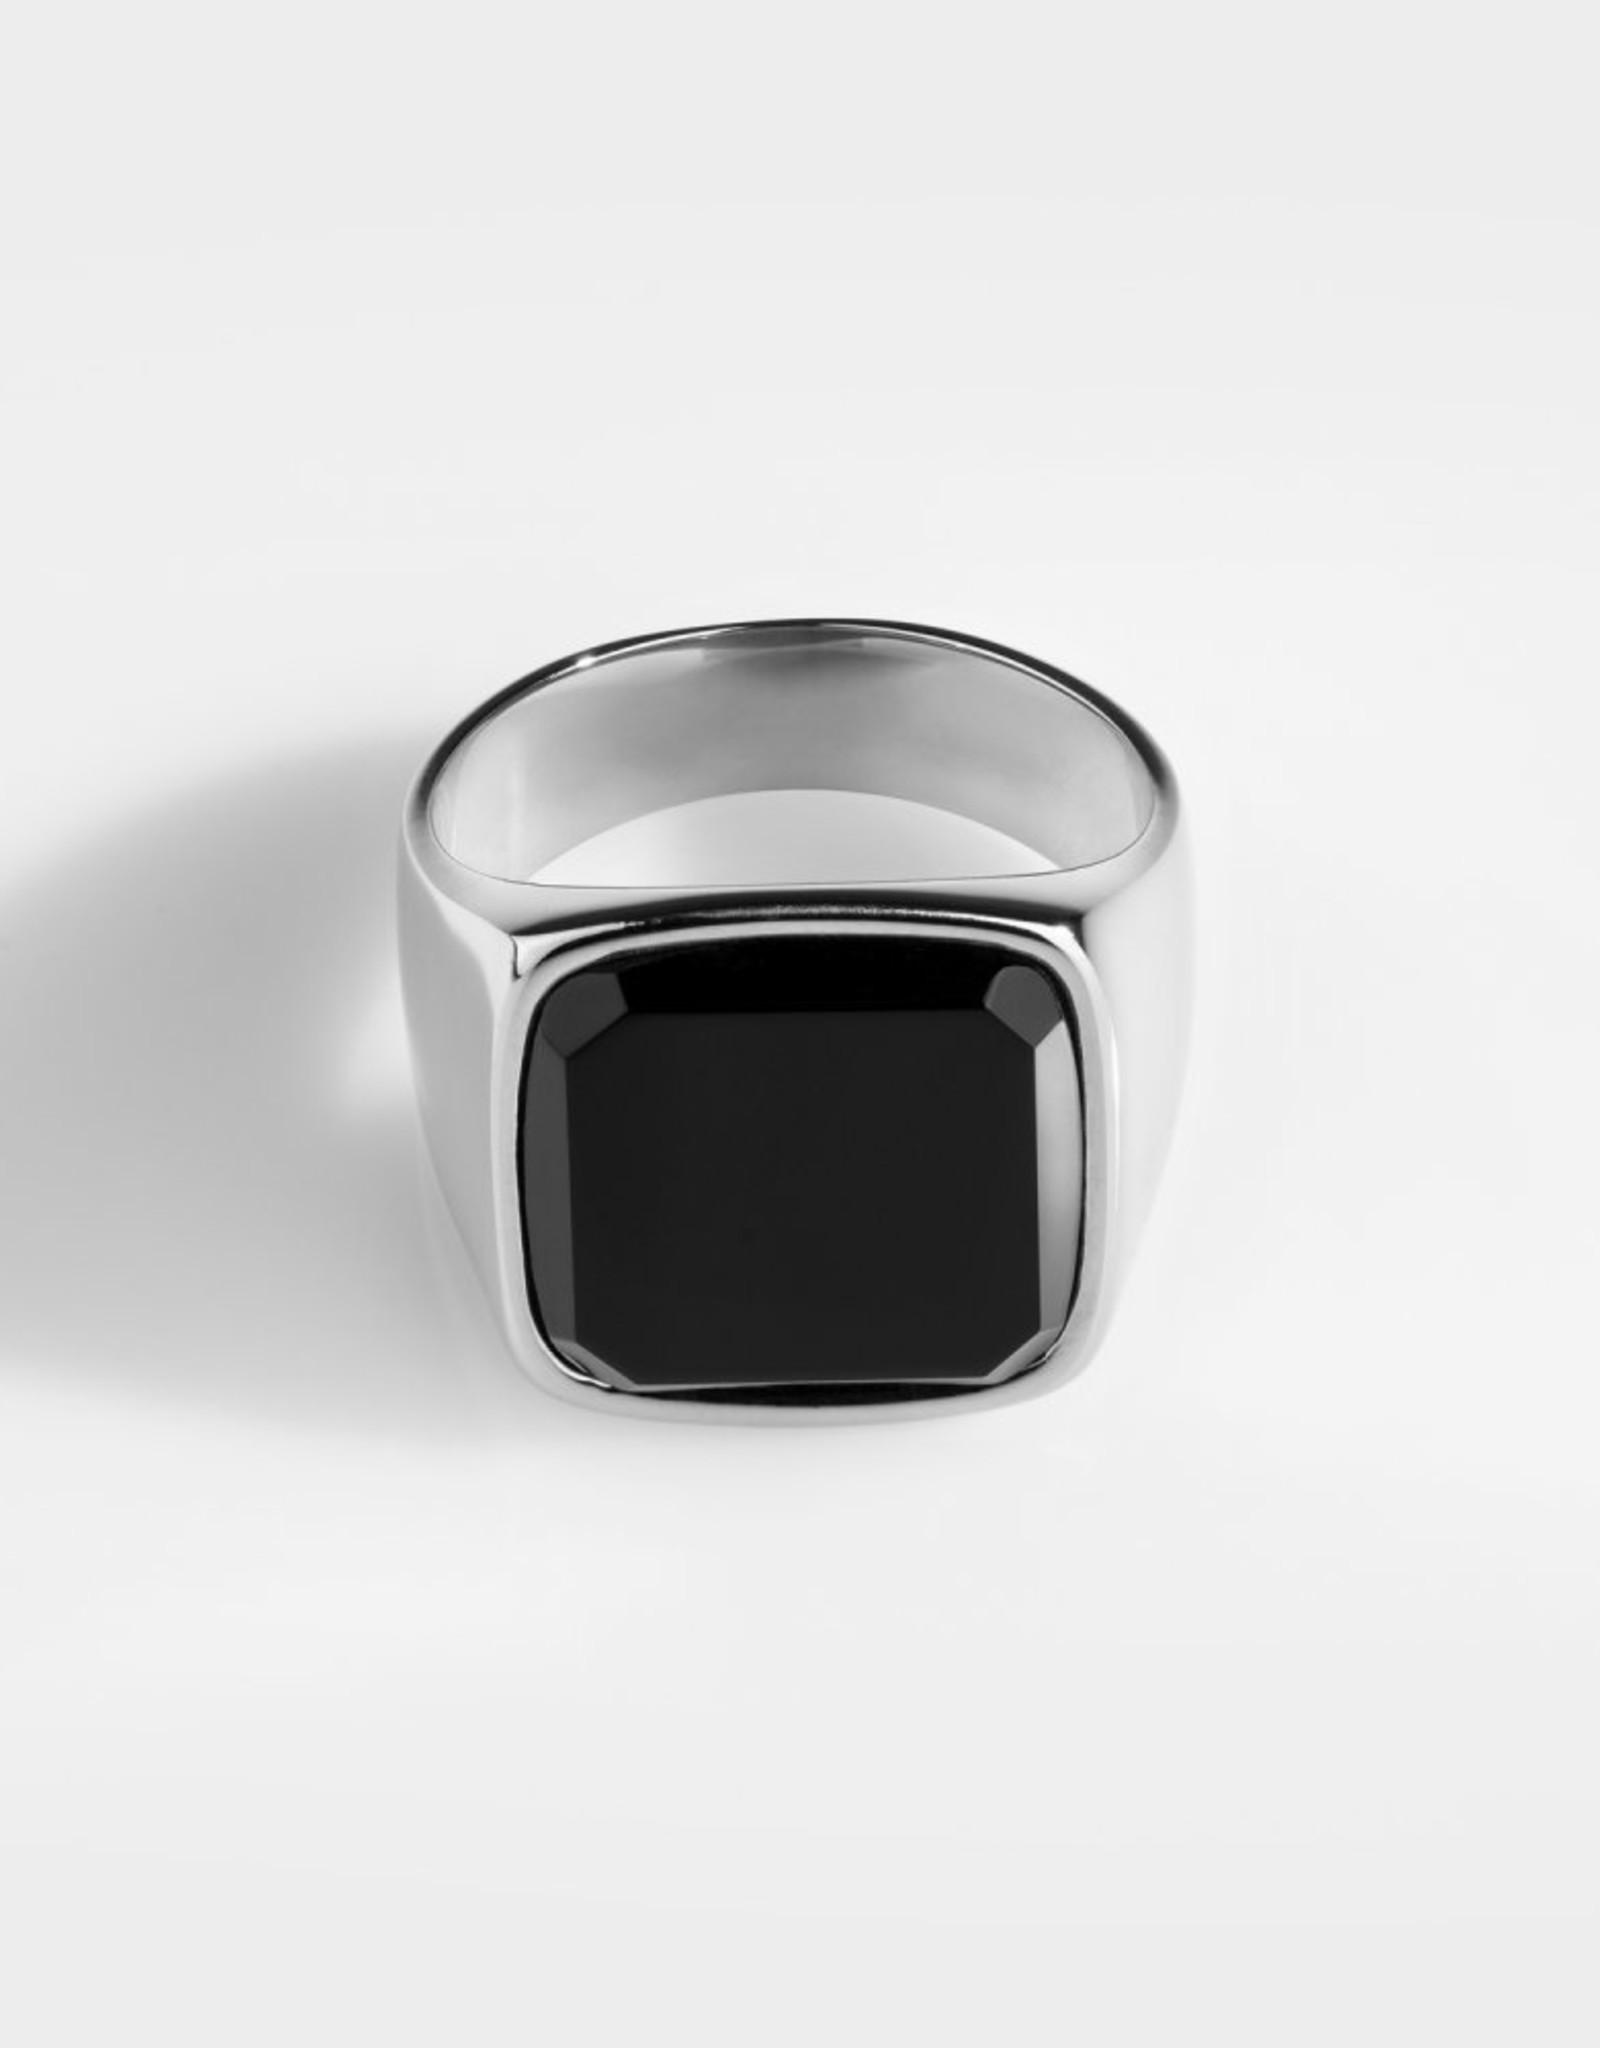 Northern Legacy Black Onyx Oversize Signature - Gold Tone Ring 20